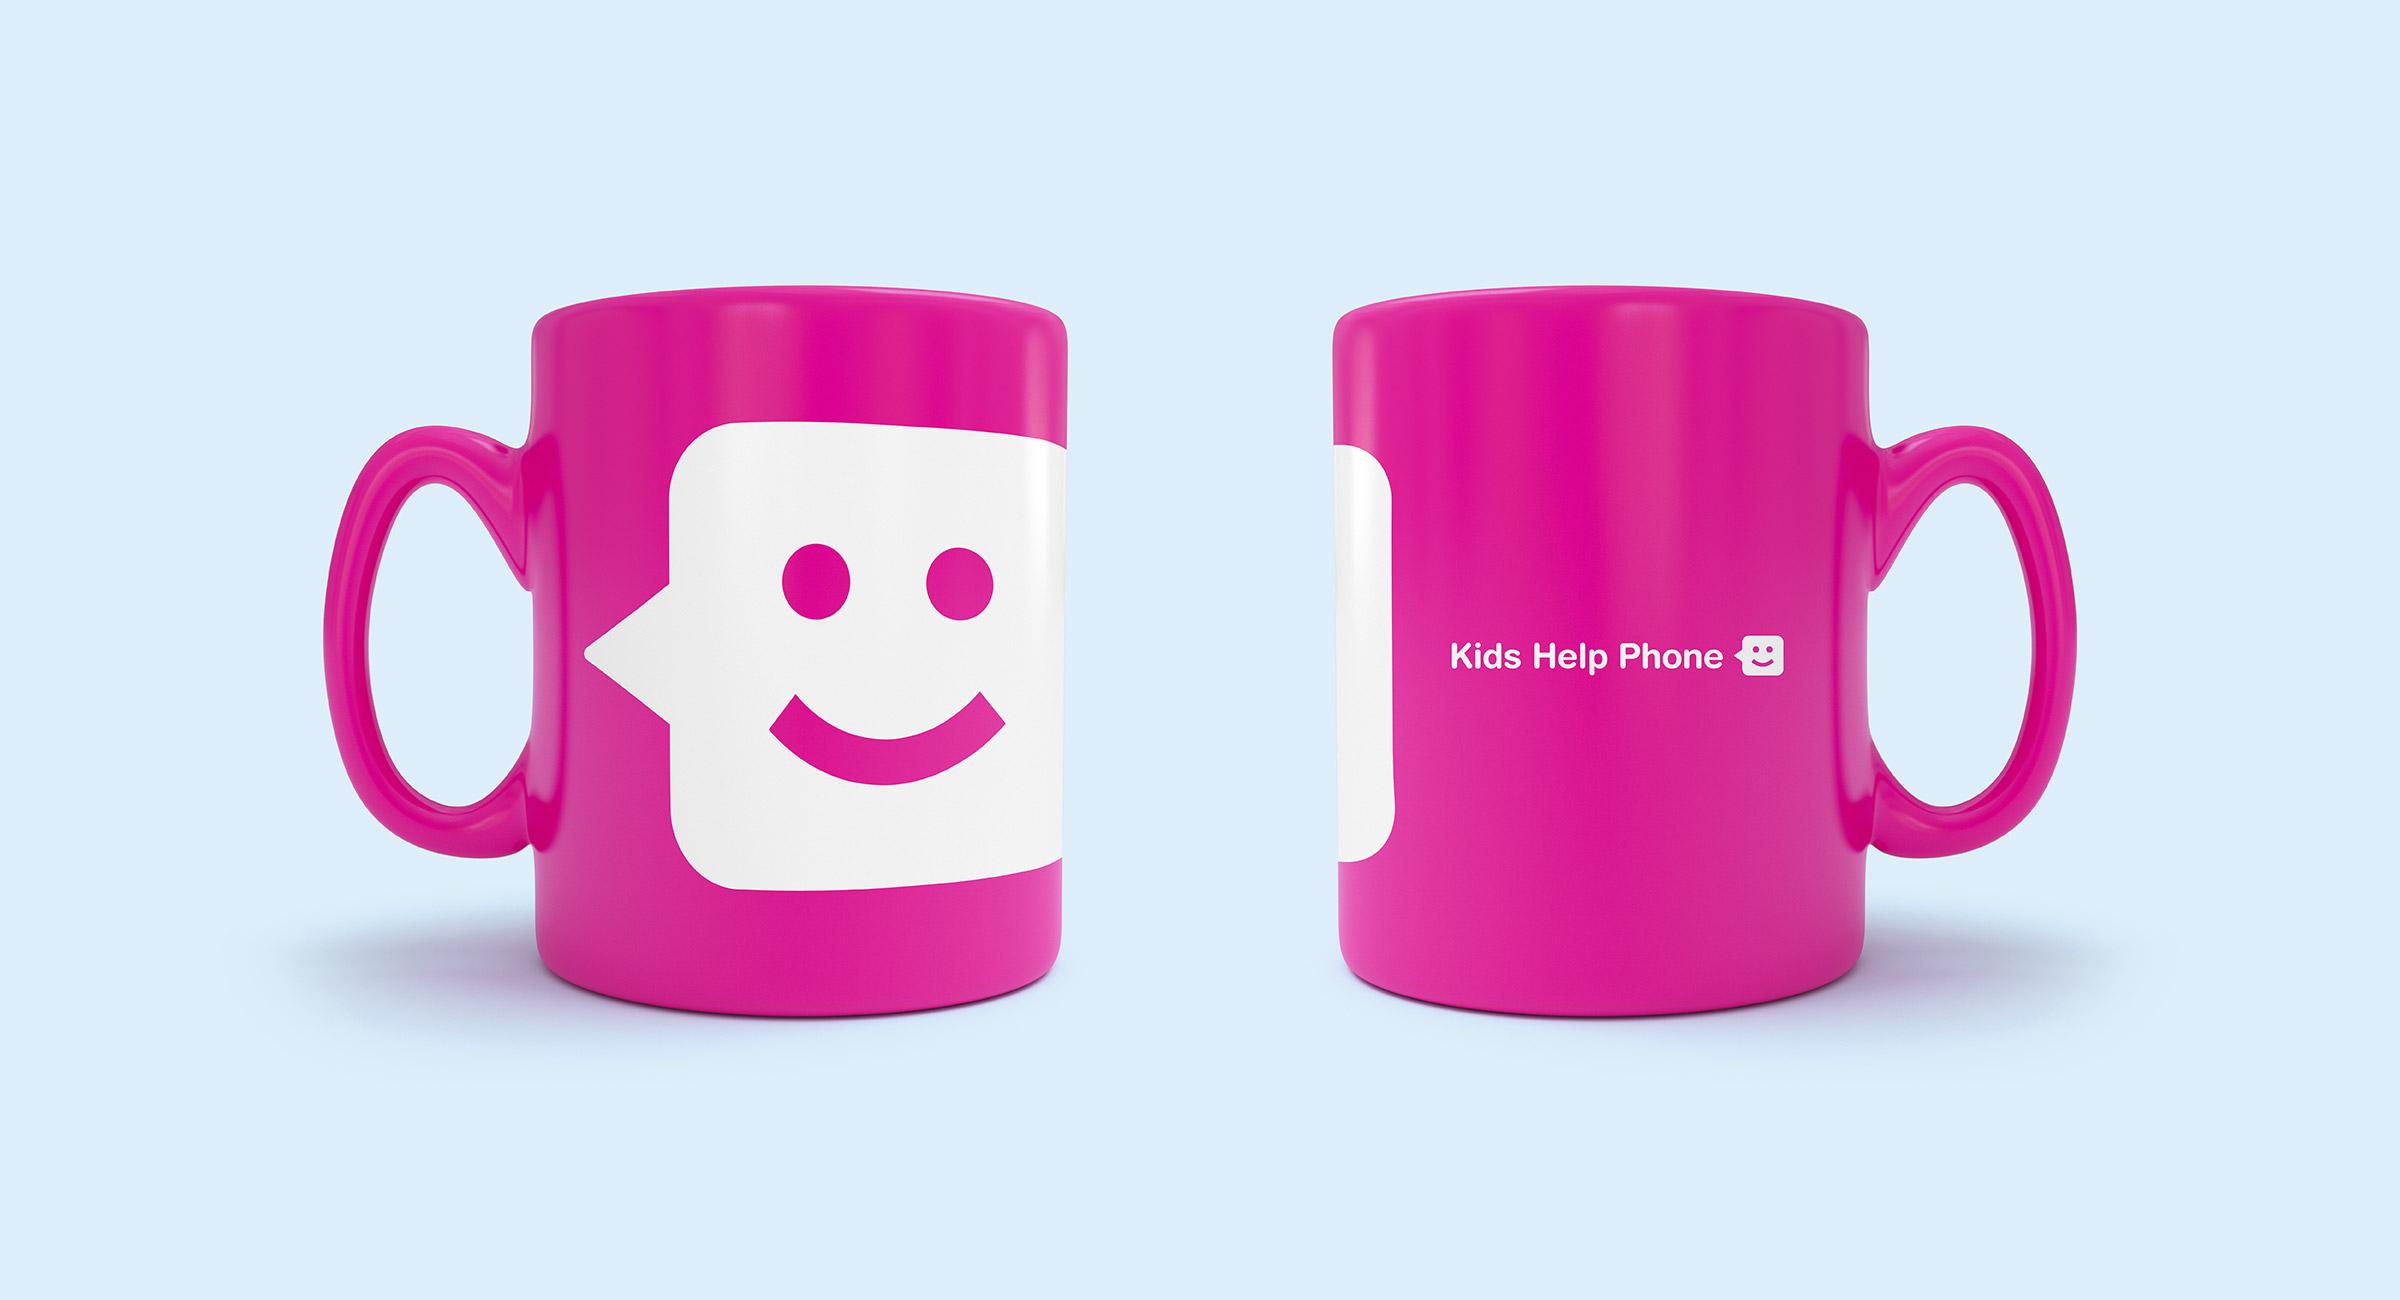 Pink mug with the Kids Help Phone logo